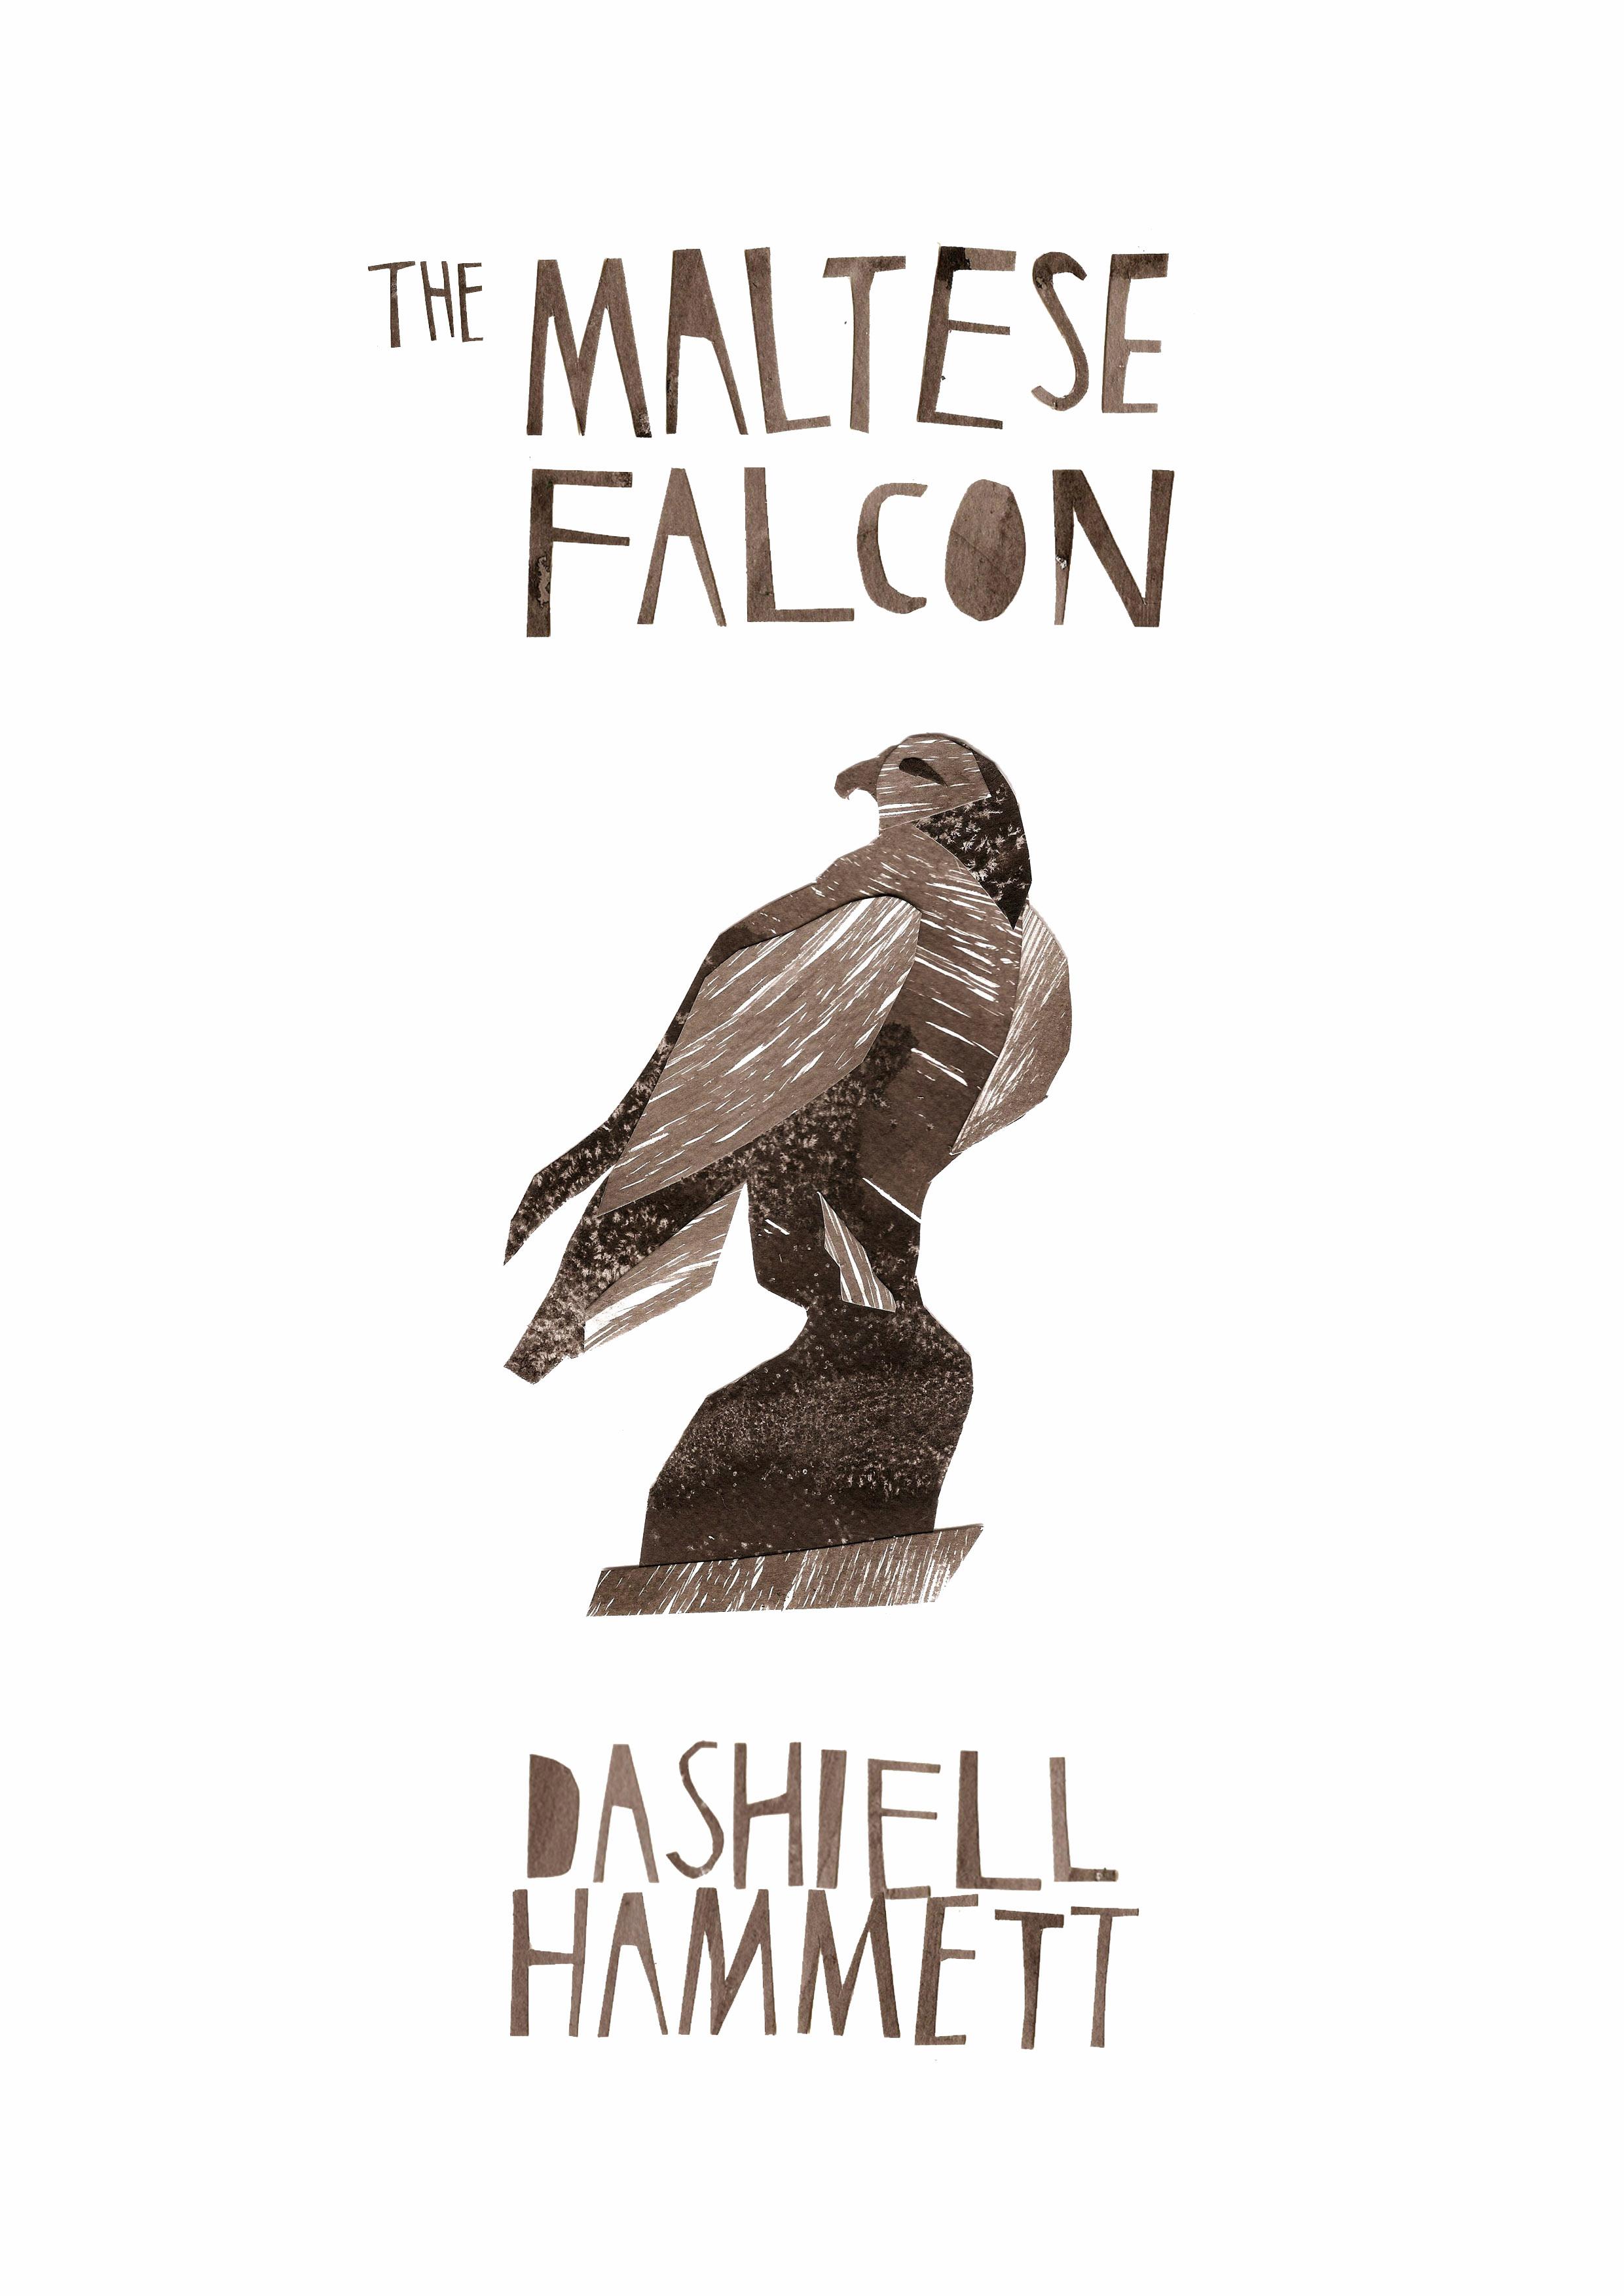 Maltese Falcon text small image